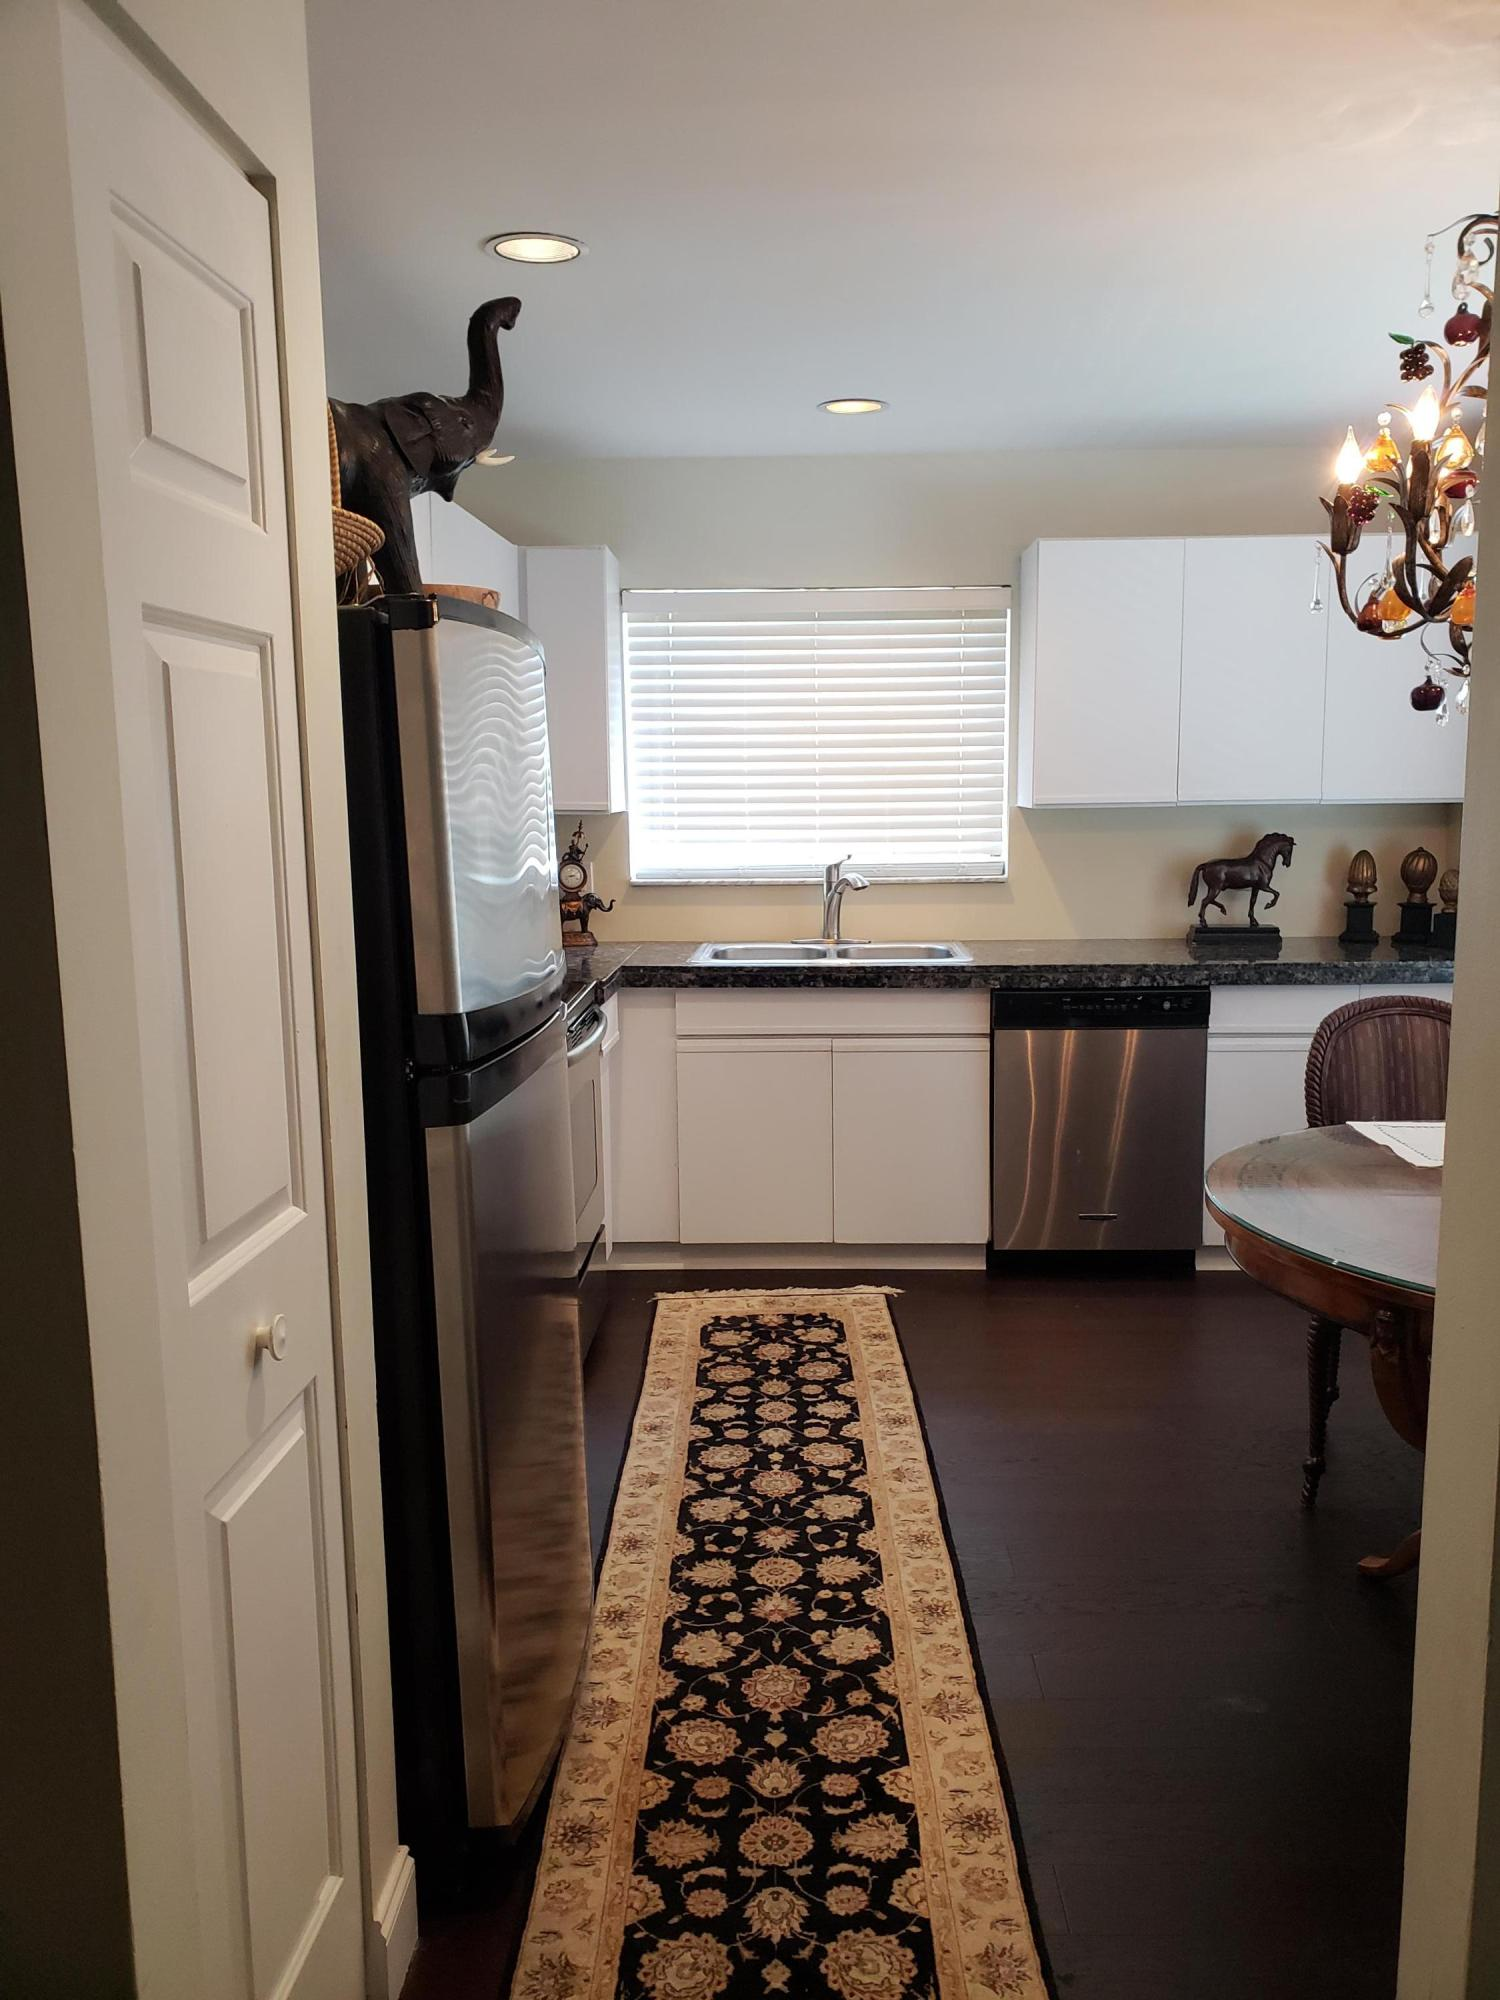 5 Lexington Lane, Palm Beach Gardens, Florida 33418, 3 Bedrooms Bedrooms, ,2 BathroomsBathrooms,Townhouse,For Rent,PGA NATIONAL,Lexington,1,RX-10478061